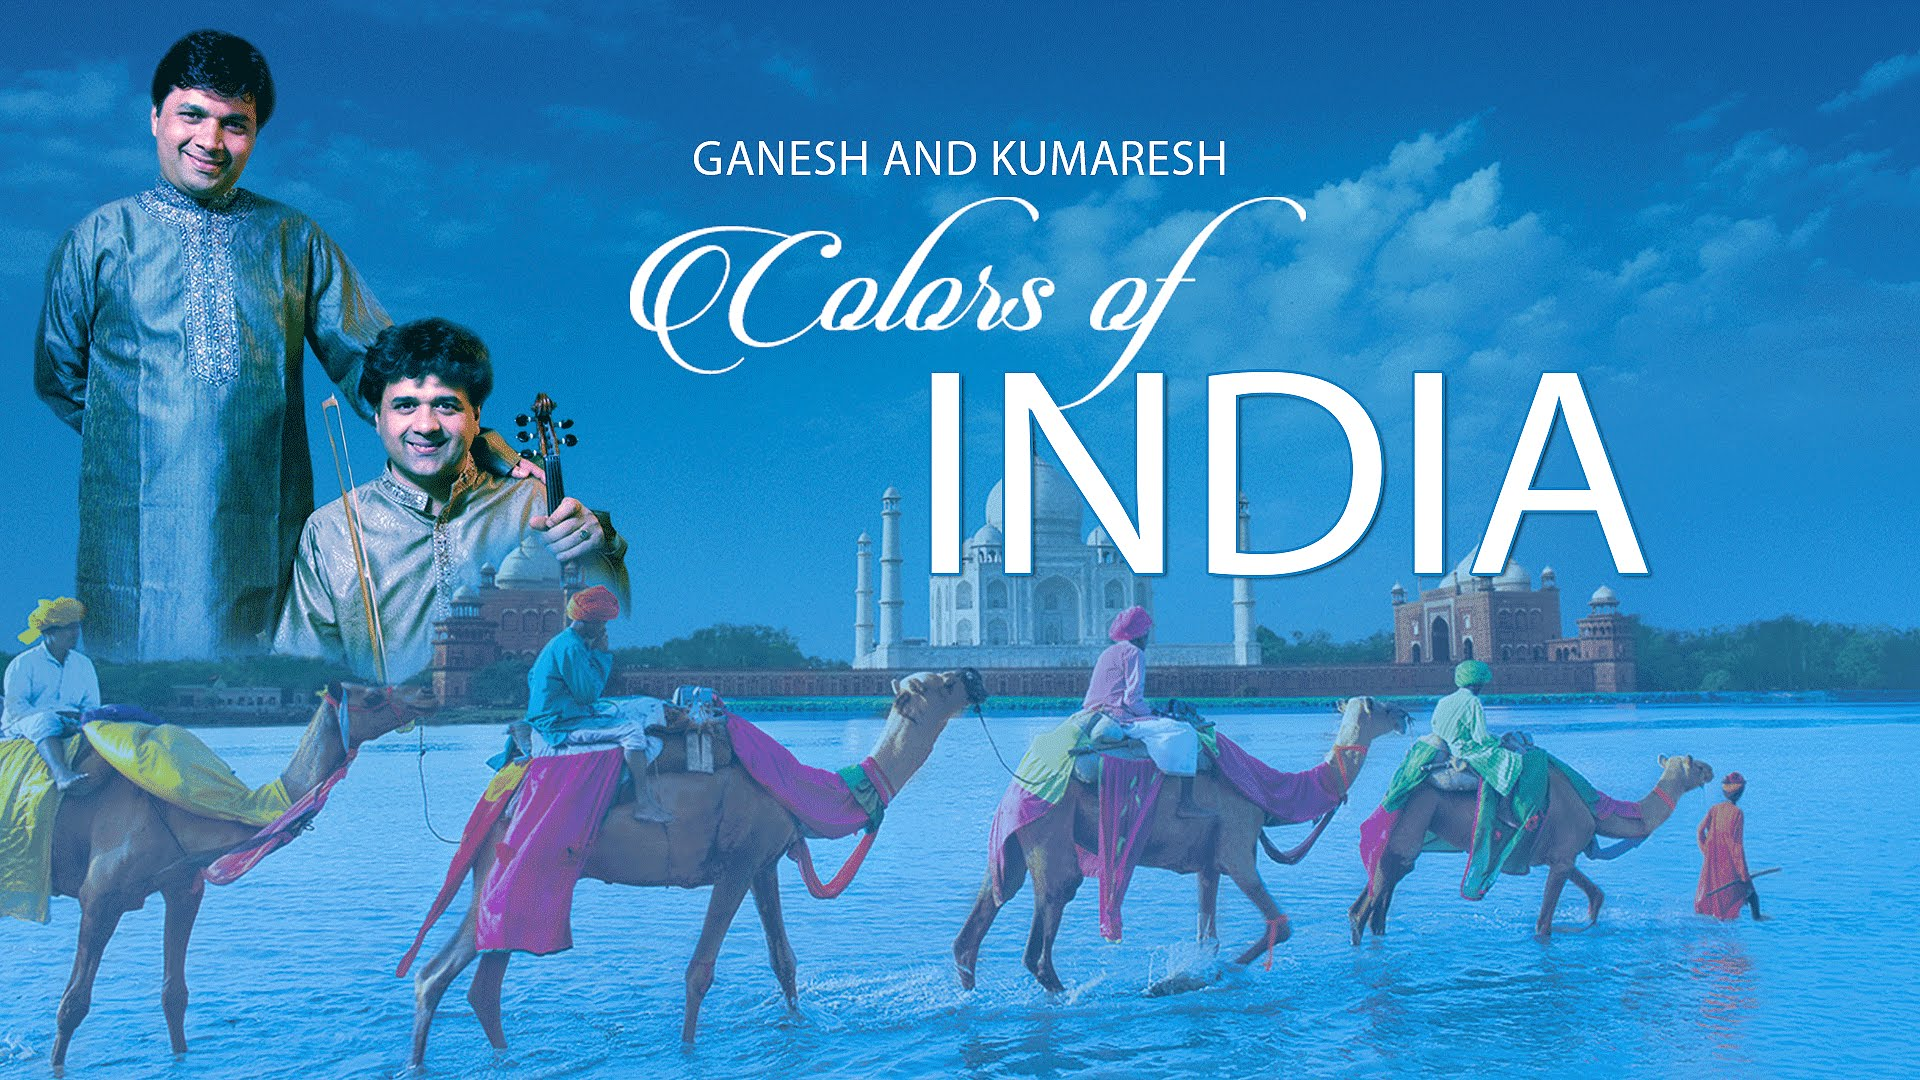 Colors of India - Ganesh and Kumaresh  Image